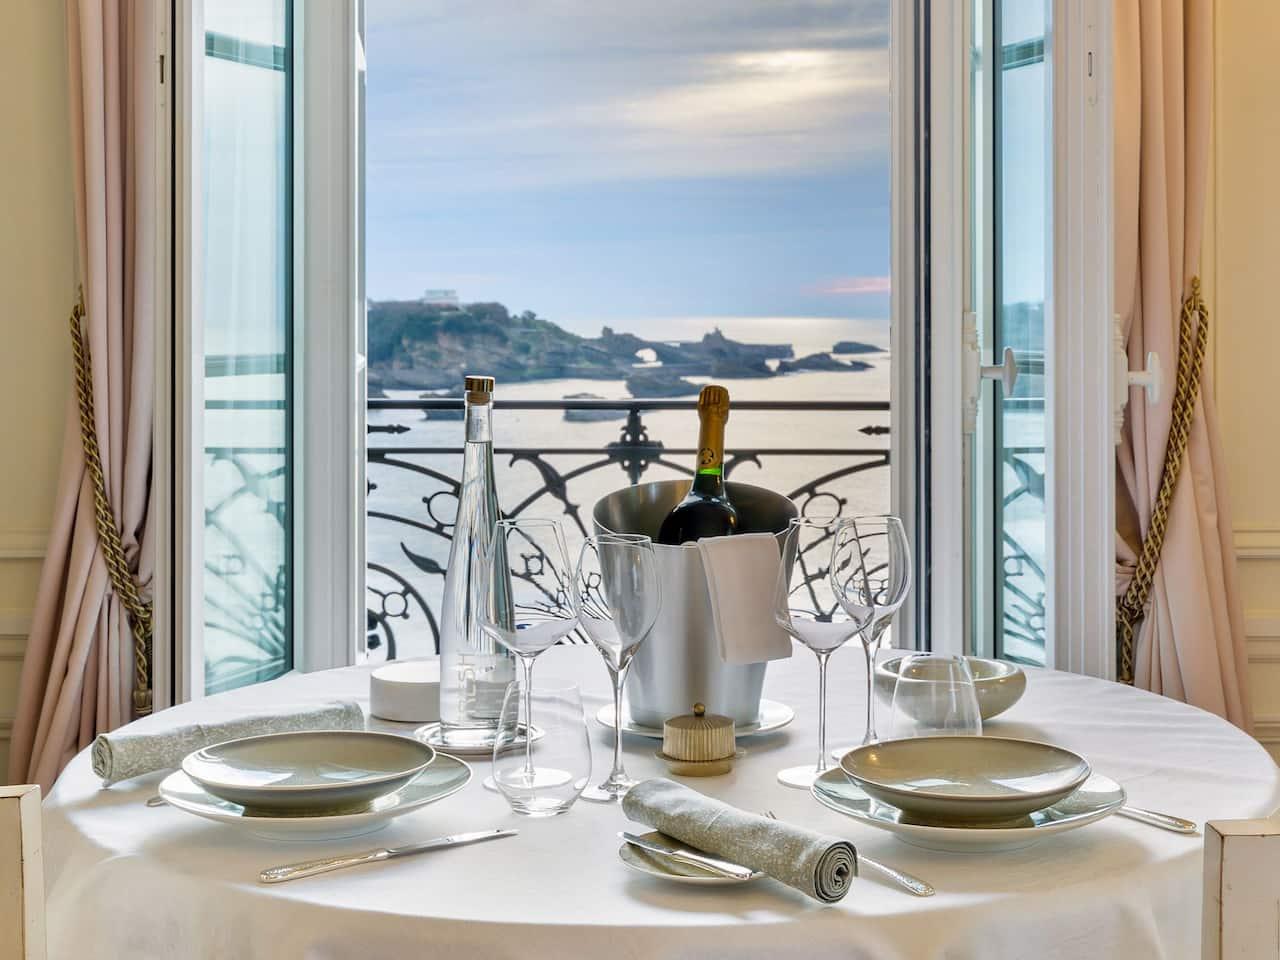 Room Service at Hôtel du Palais overlooking the Ocean